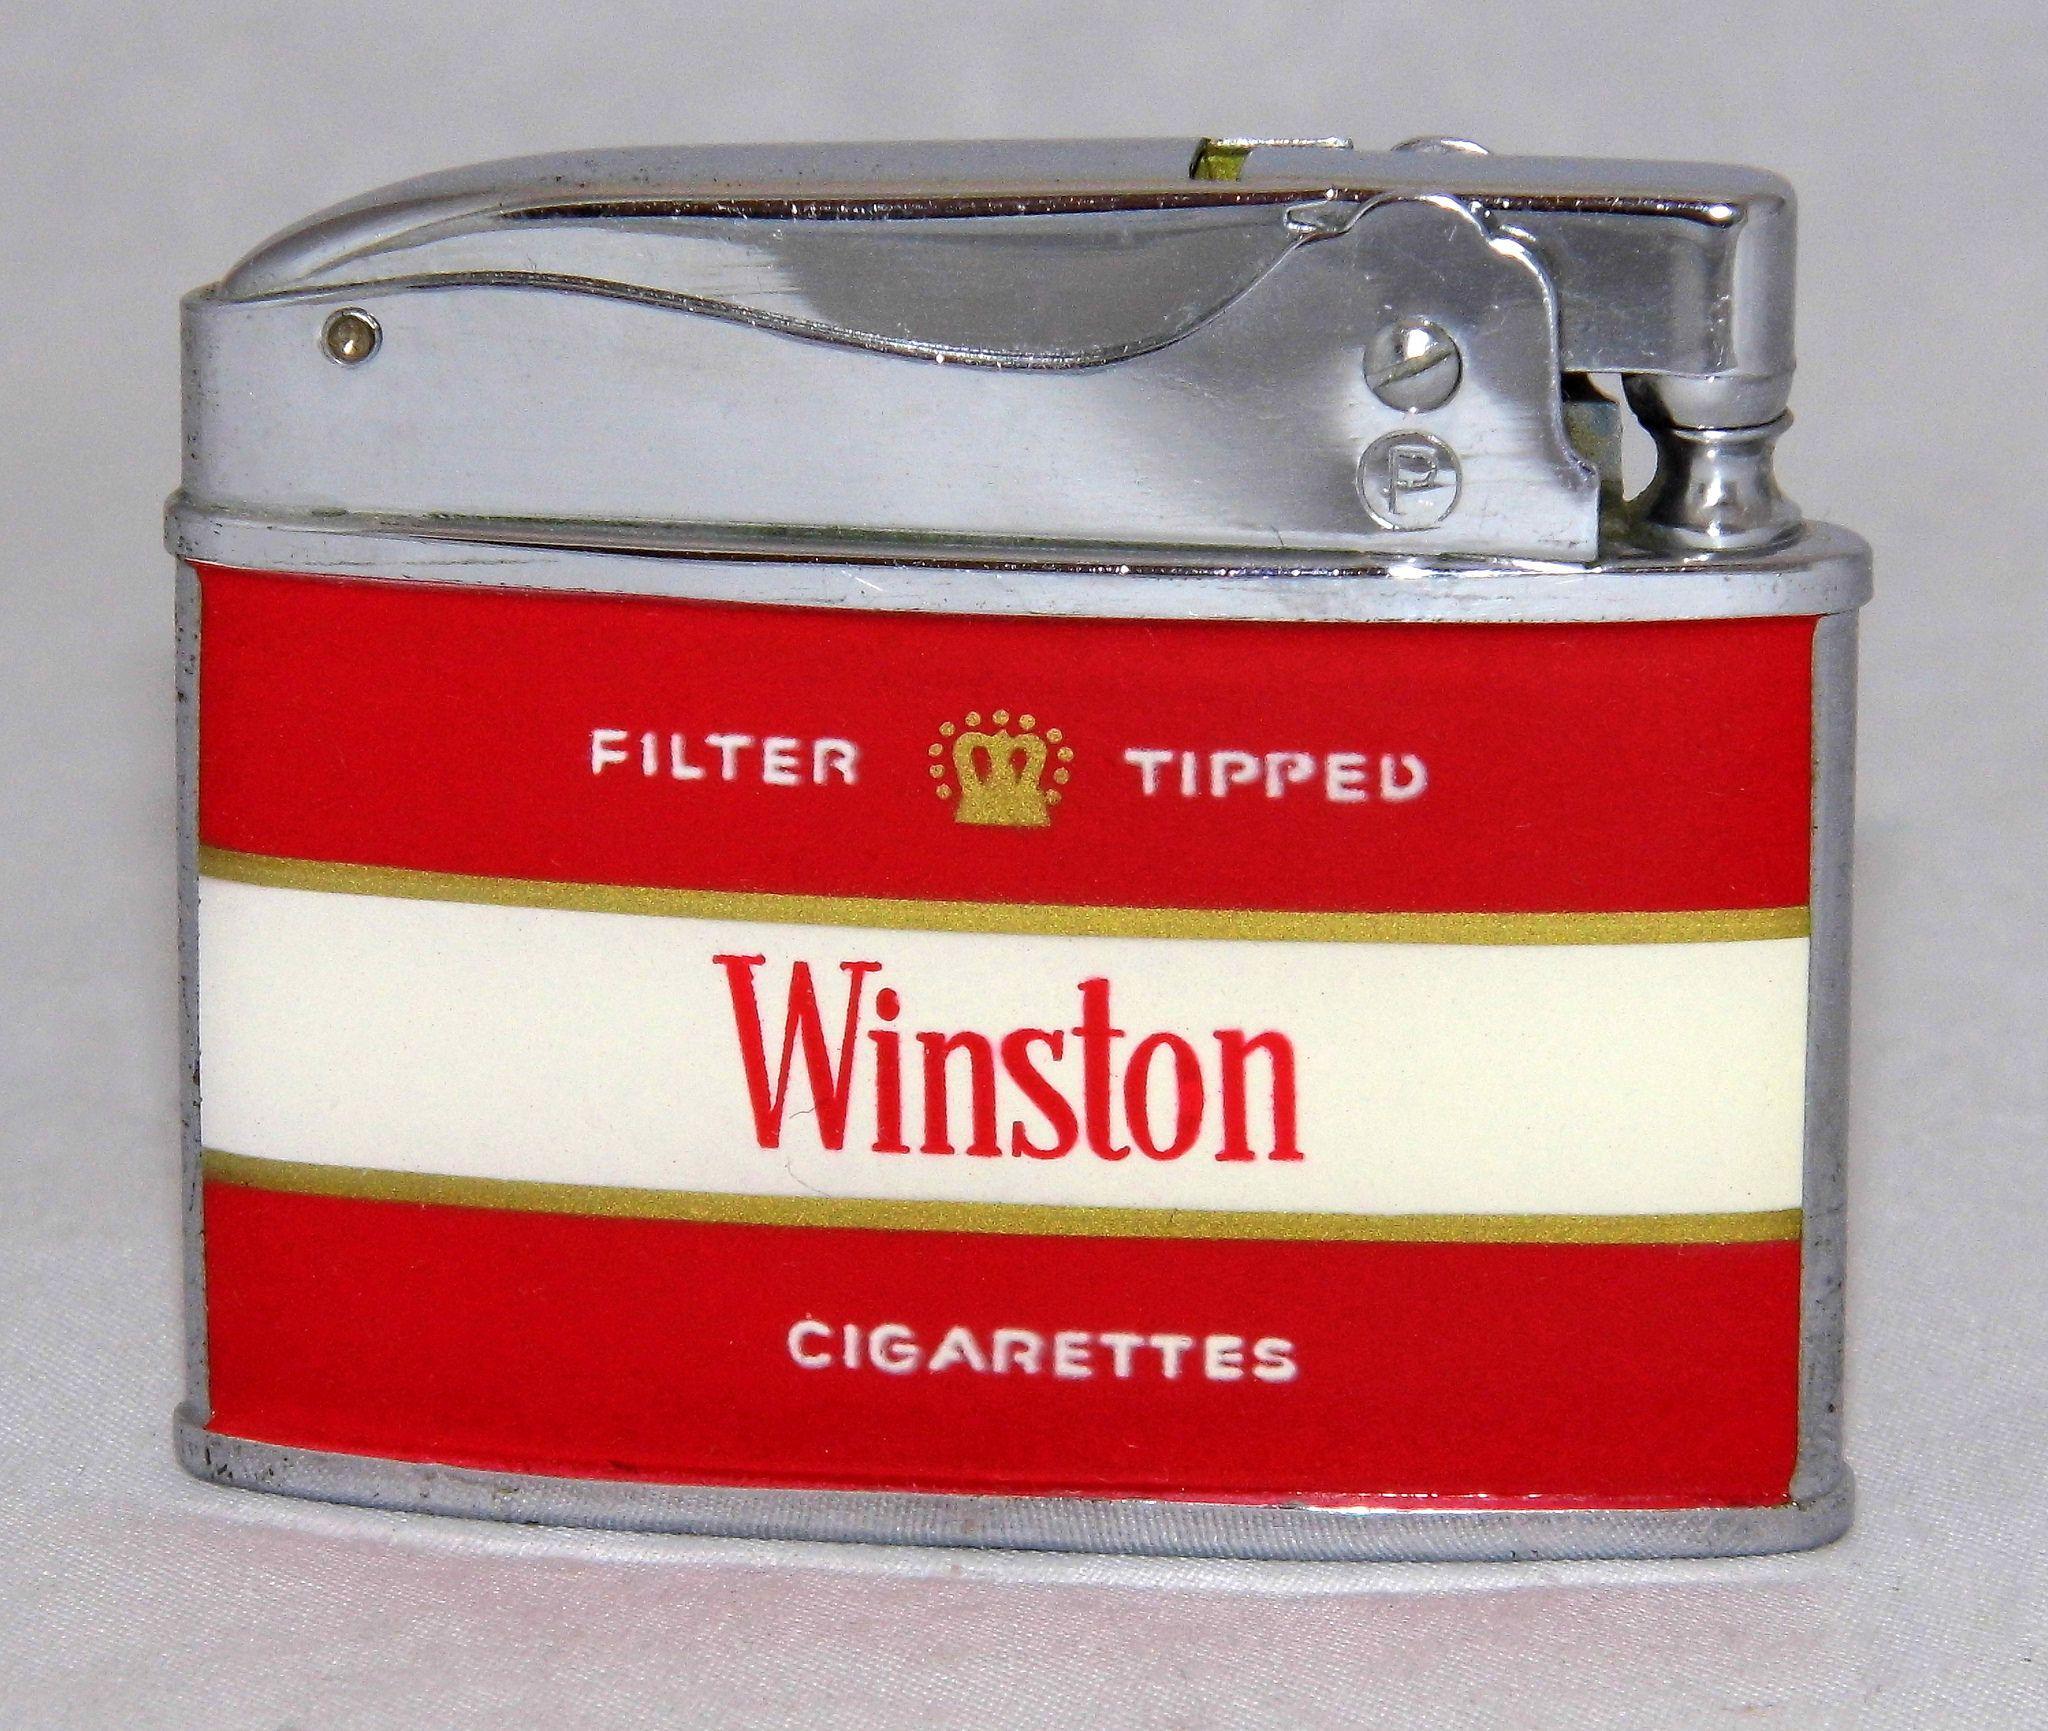 1933 1937 Extremely Rare Zippo Lighter Case Unused One Of Catawiki